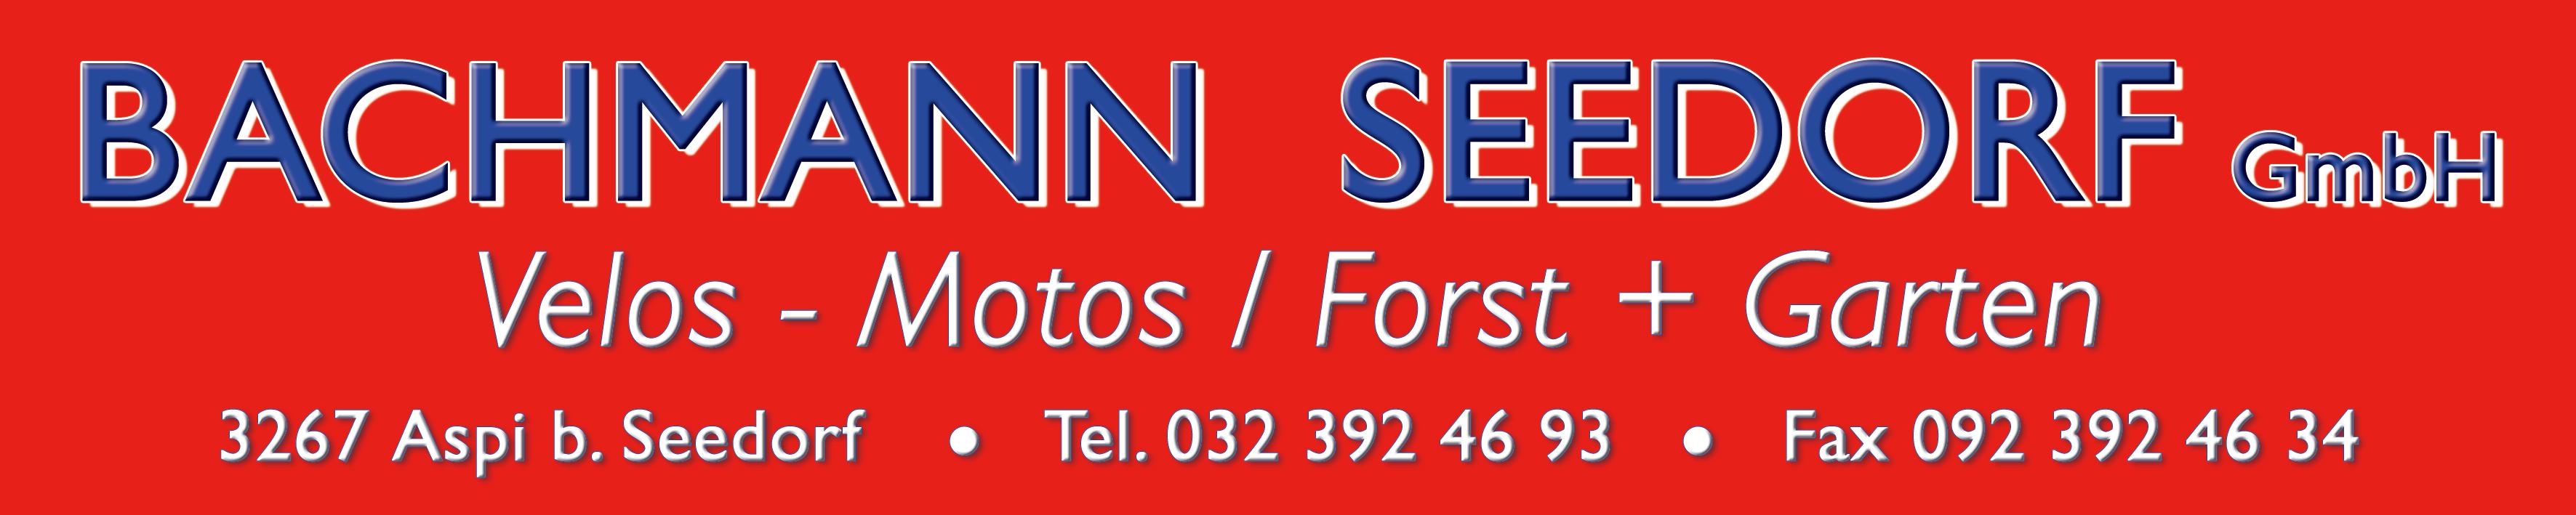 Bachmann Seedorf GmbH